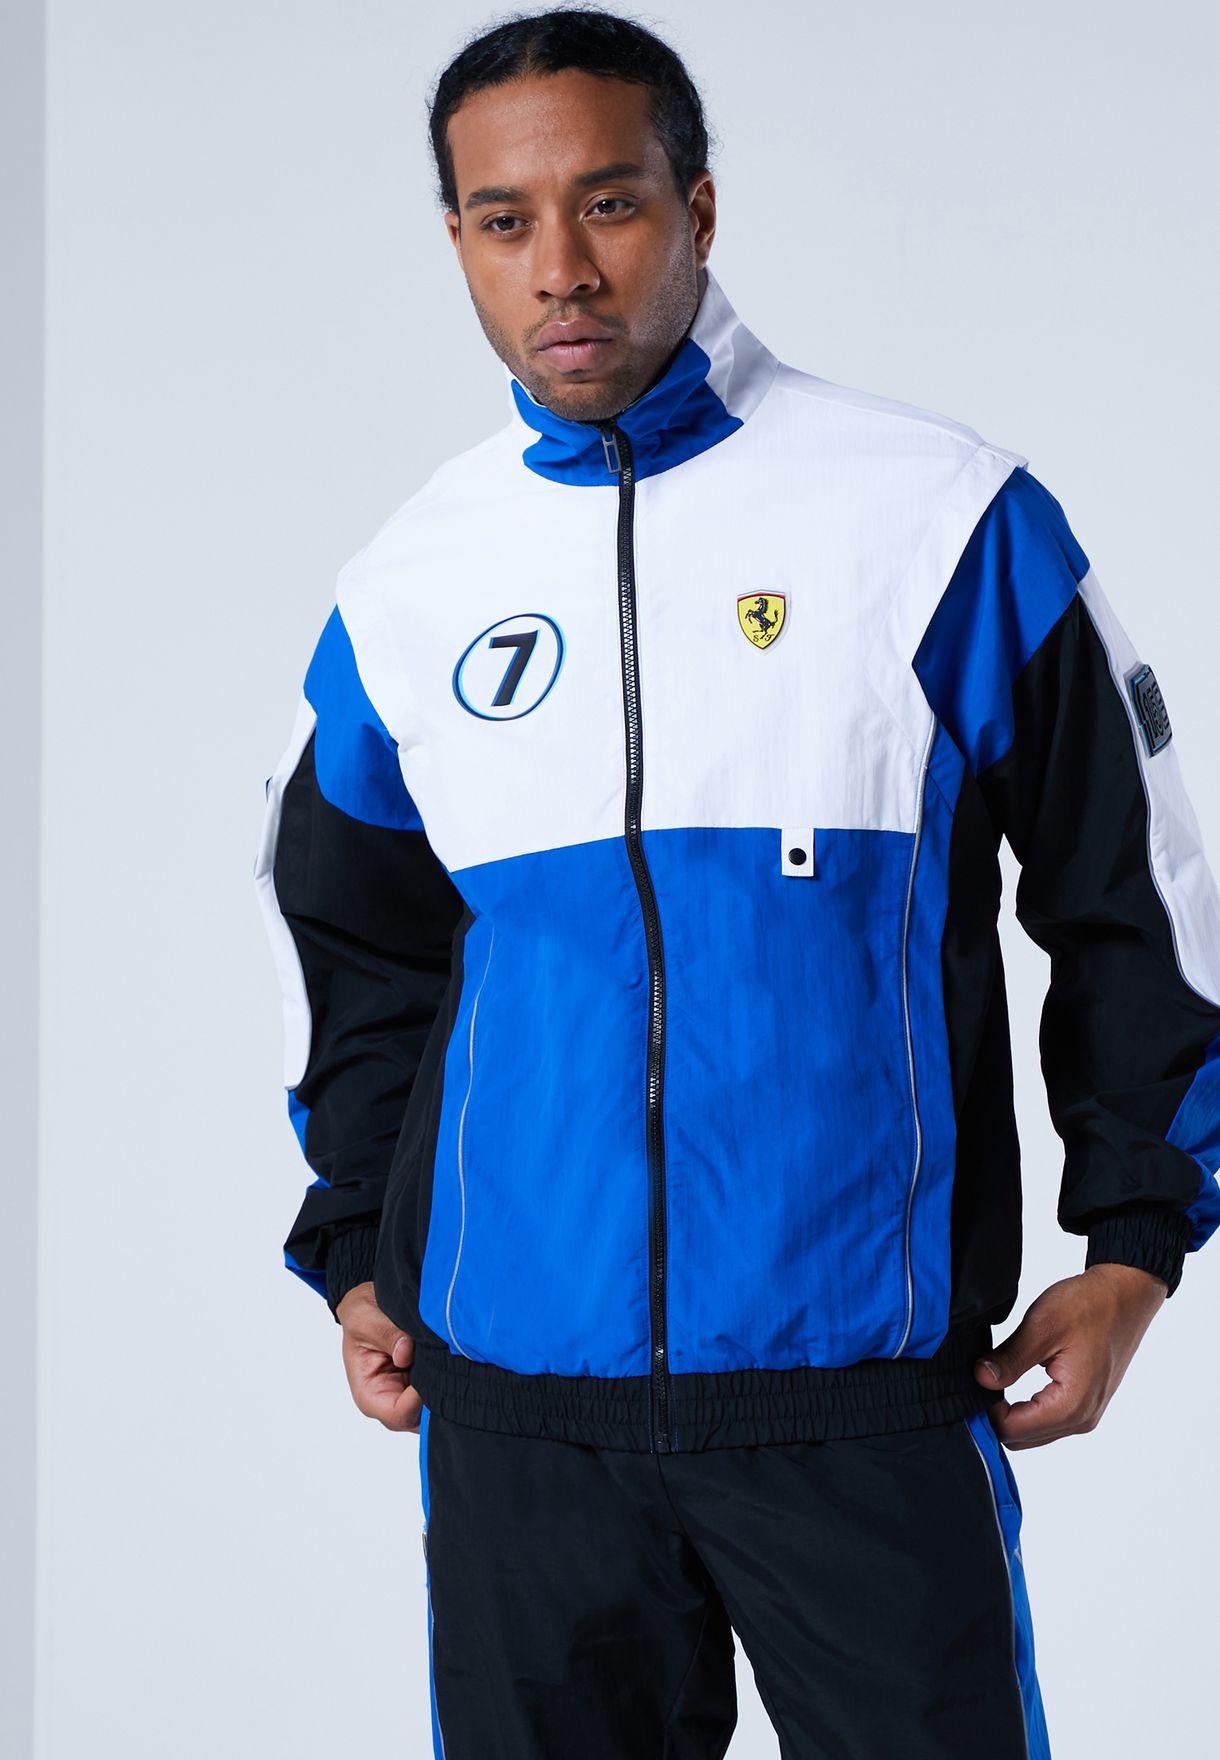 Buy Puma Blue Ferrari Race Street Woven Jacket For Men In Manama Other Cities 59793902